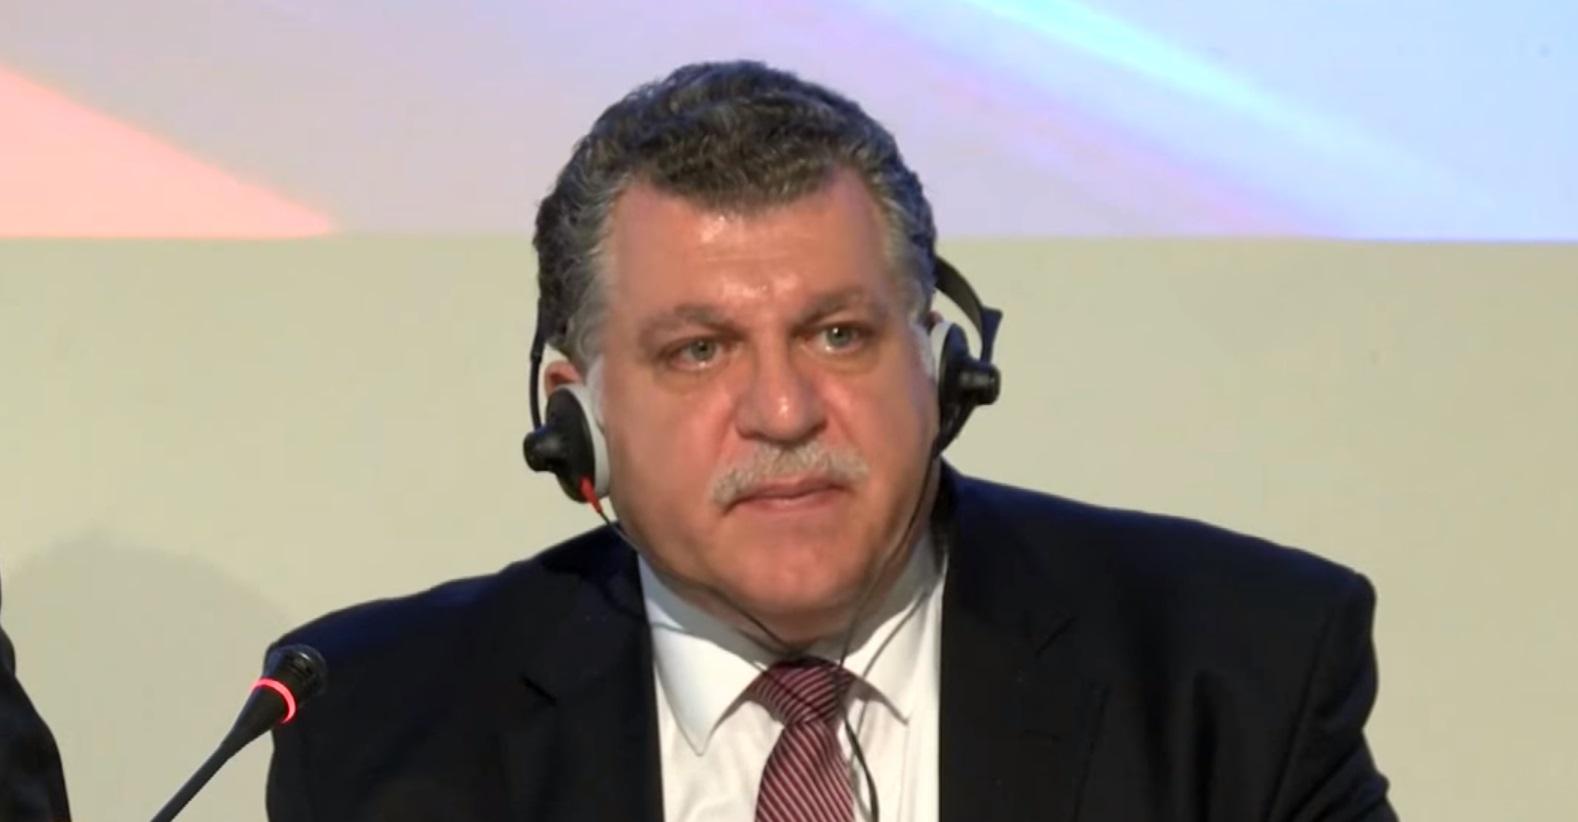 Syrian Army Discovered German, British Made Chemicals In Duma – Syrian Deputy Envoy To OPCW